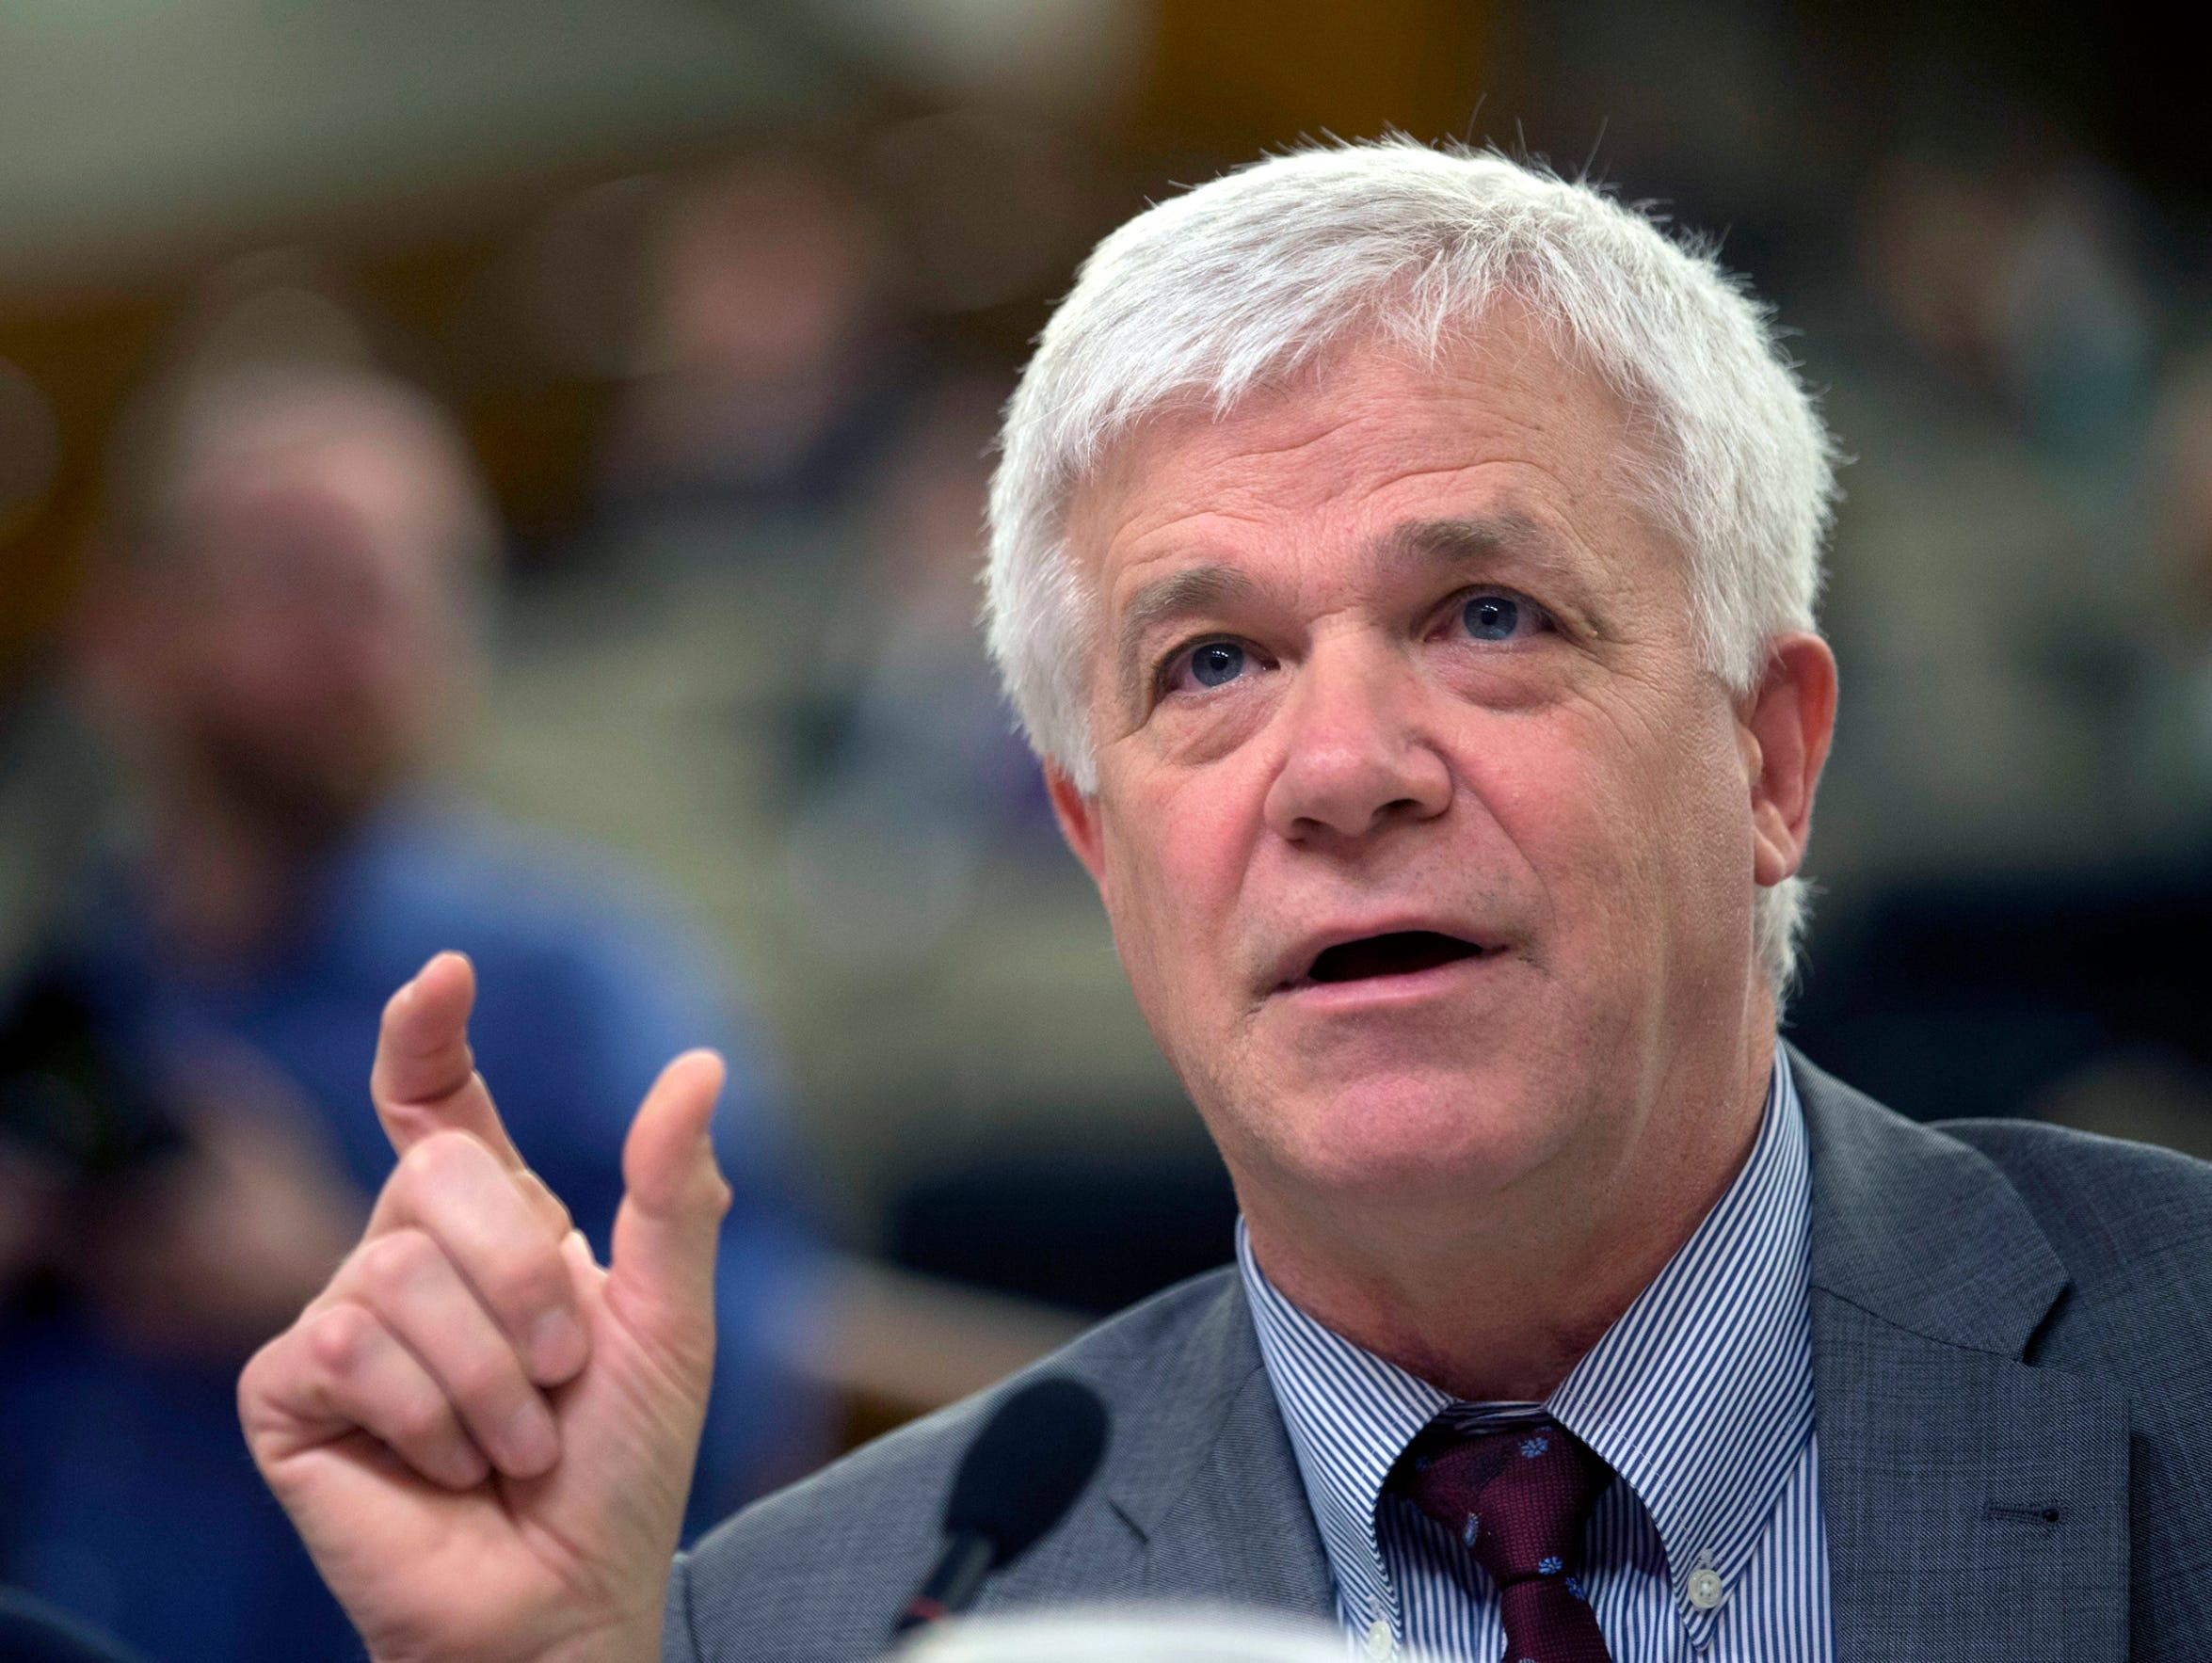 Former DEC commissioner Joseph Martens says the New